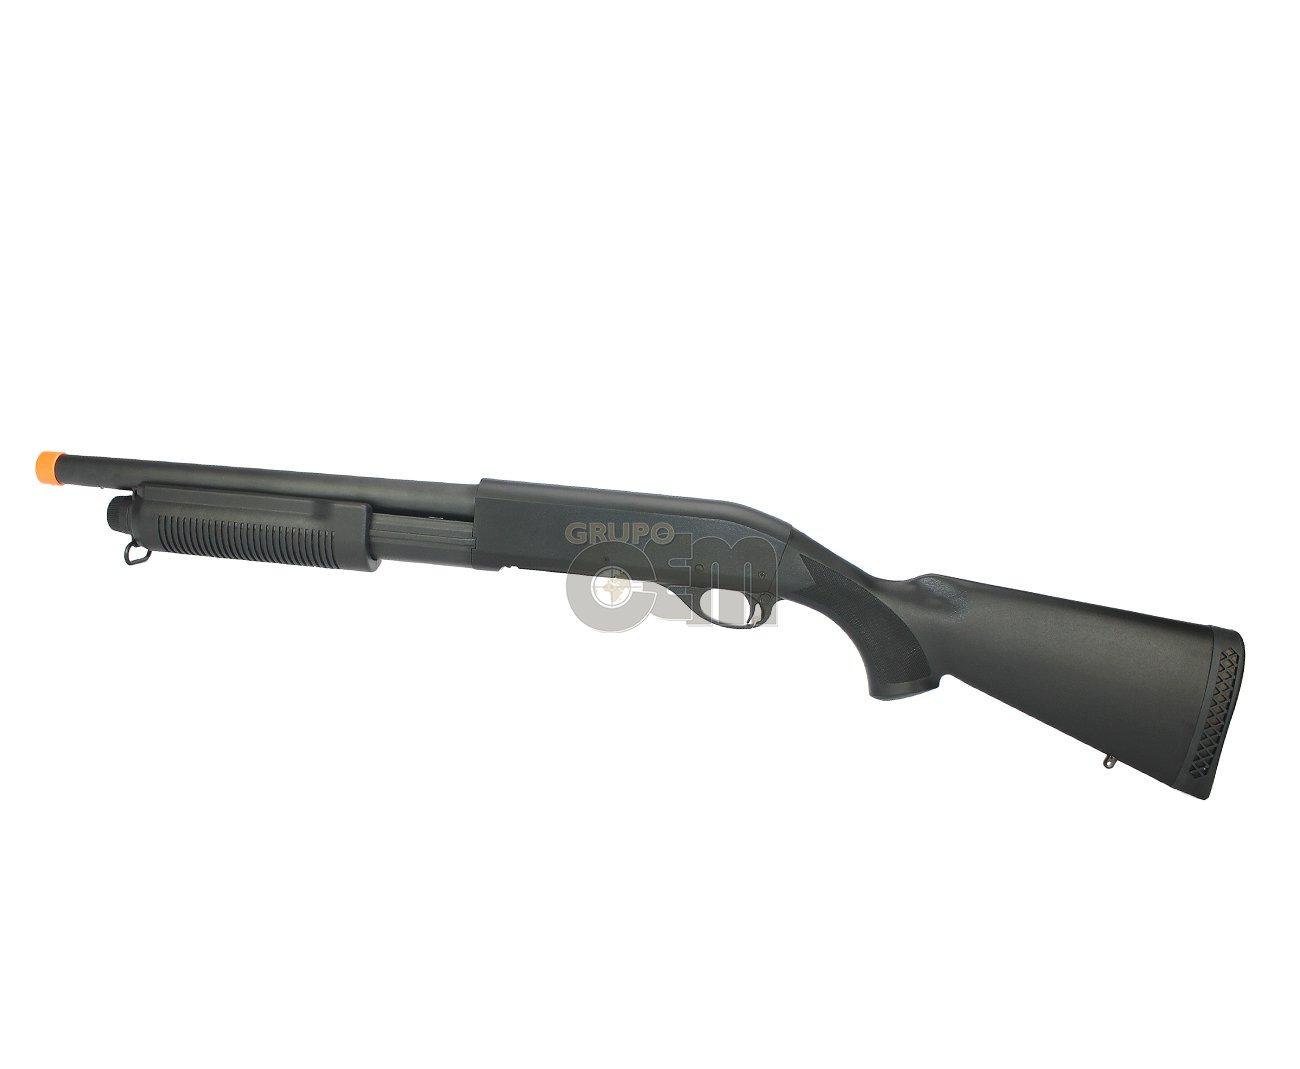 Shotgun / Escopeta De Airsoft Shotgun M870 - Cm350 6mm - Cyma